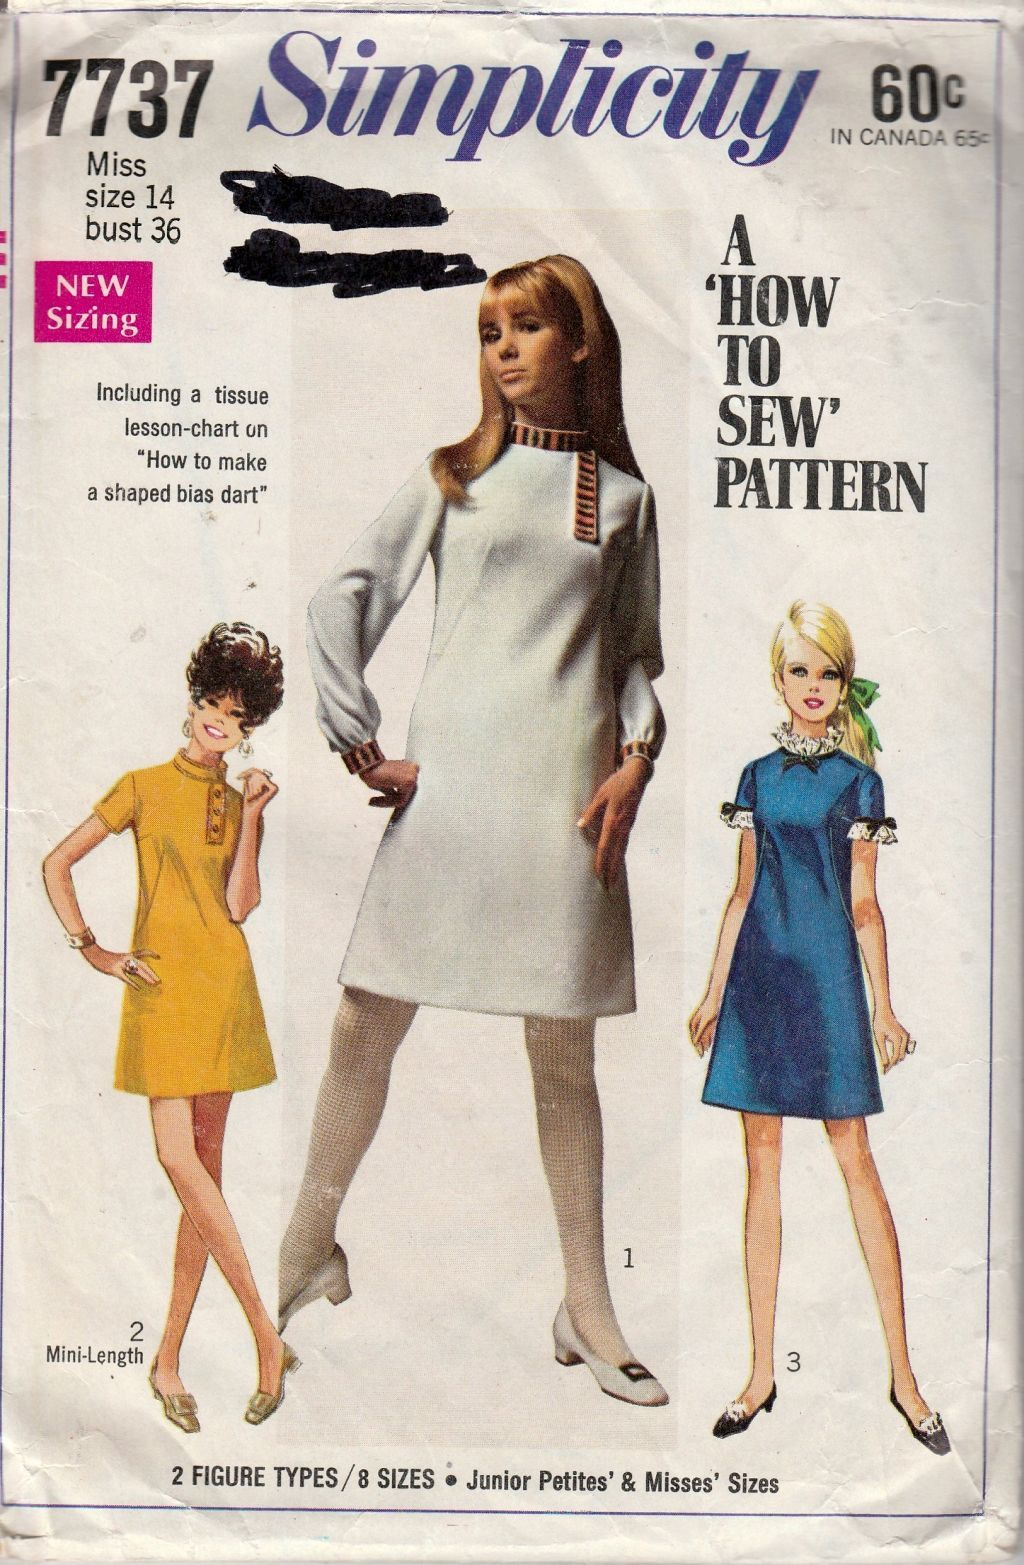 Simplicity 7737 vintage 1960s sewing pattern ladies mad men mod simplicity 7737 vintage 1960s sewing pattern ladies mad men mod dress a line jeuxipadfo Choice Image